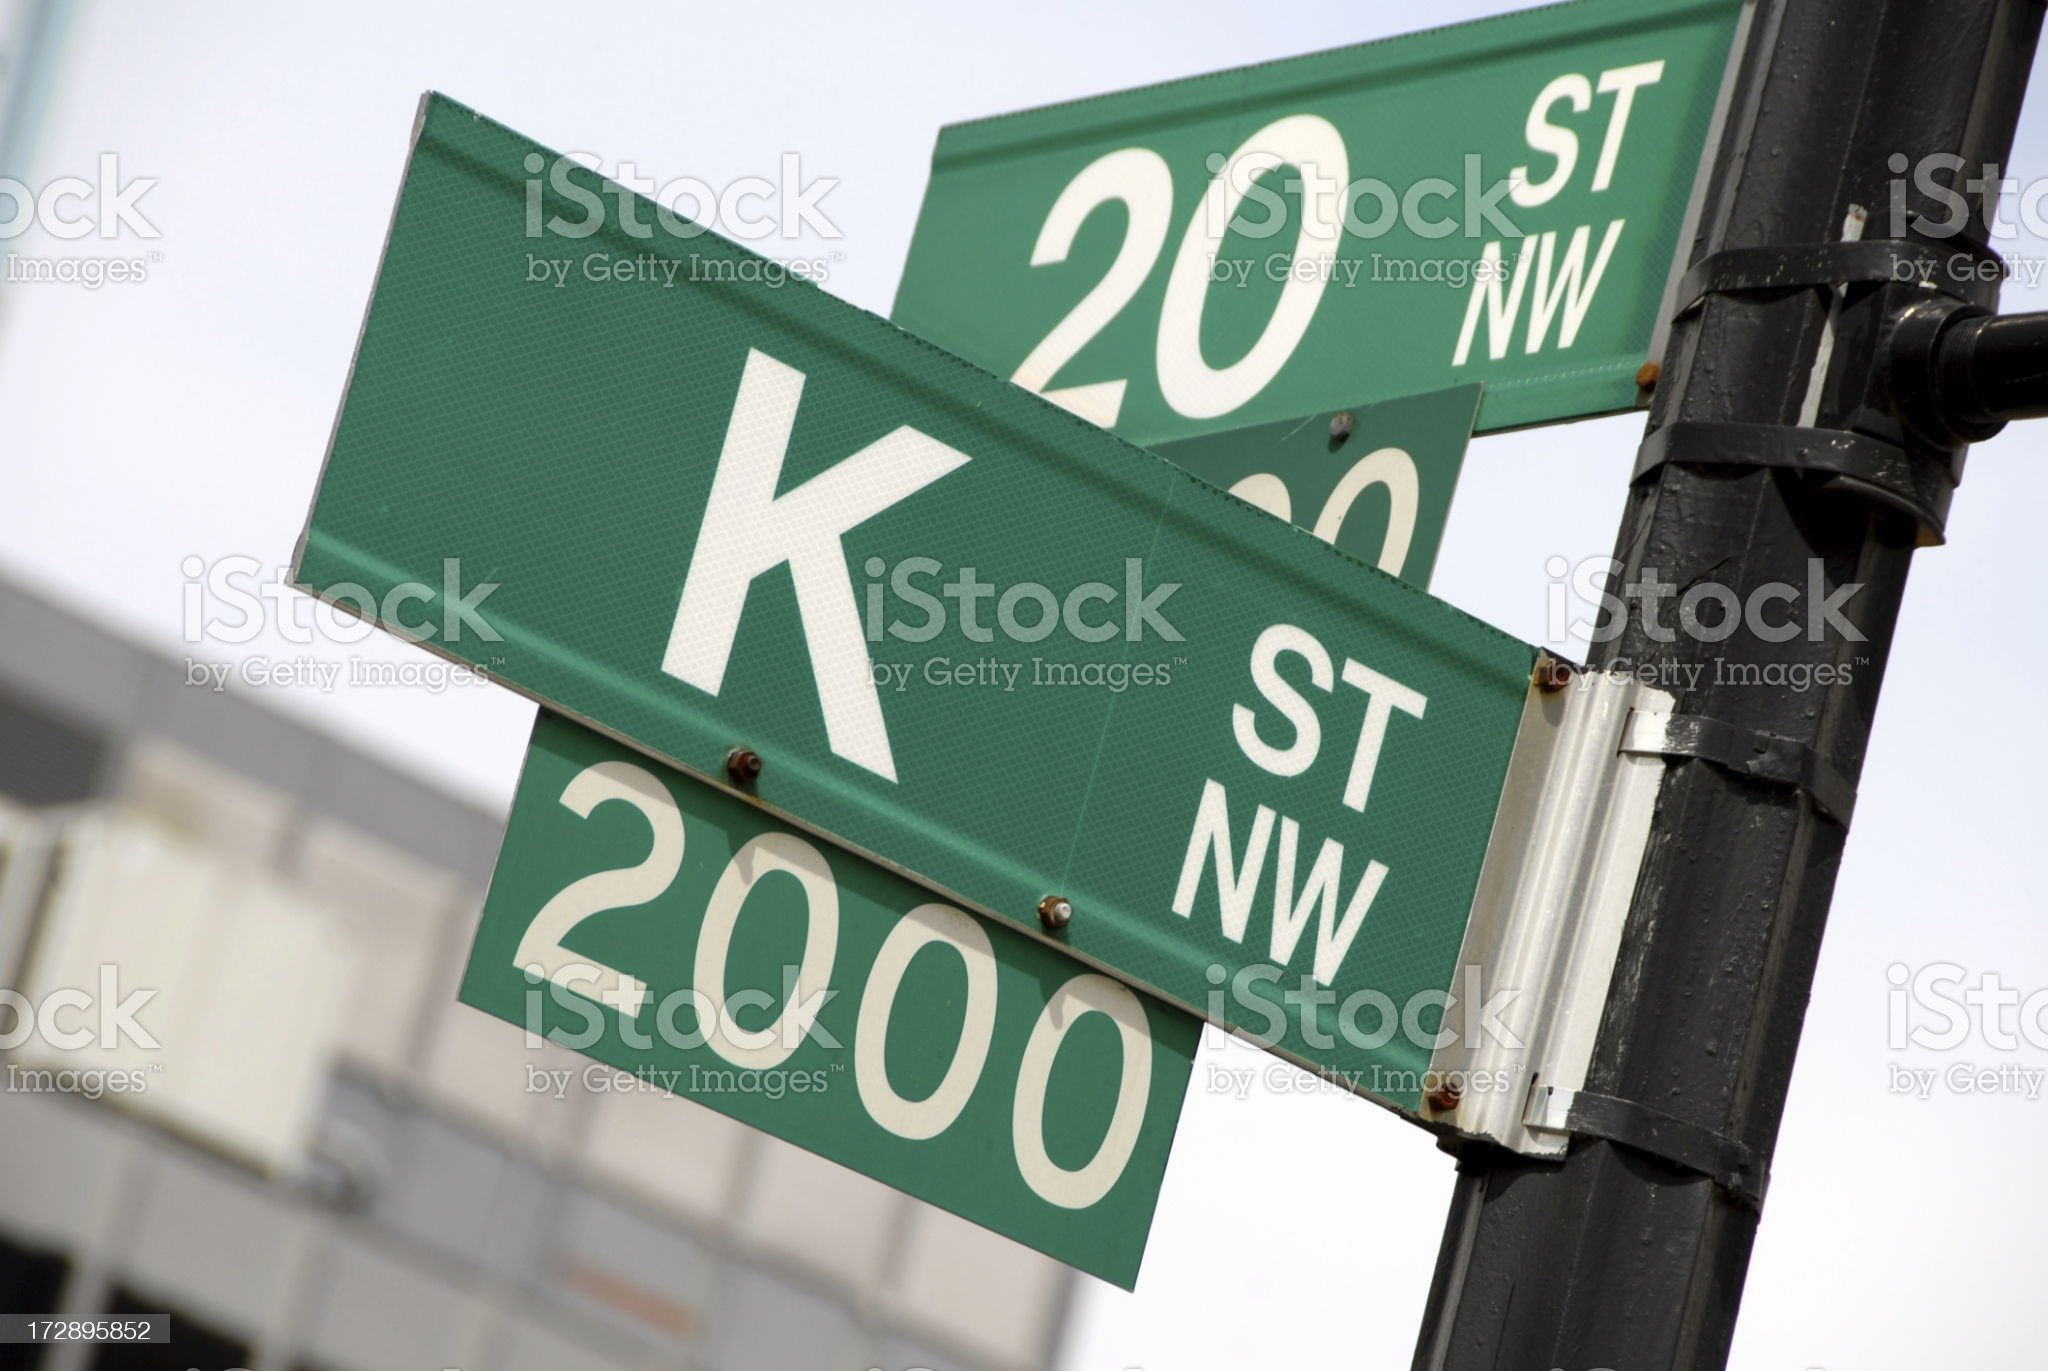 K Street, The Lobbyist Address in Washington DC royalty-free stock photo